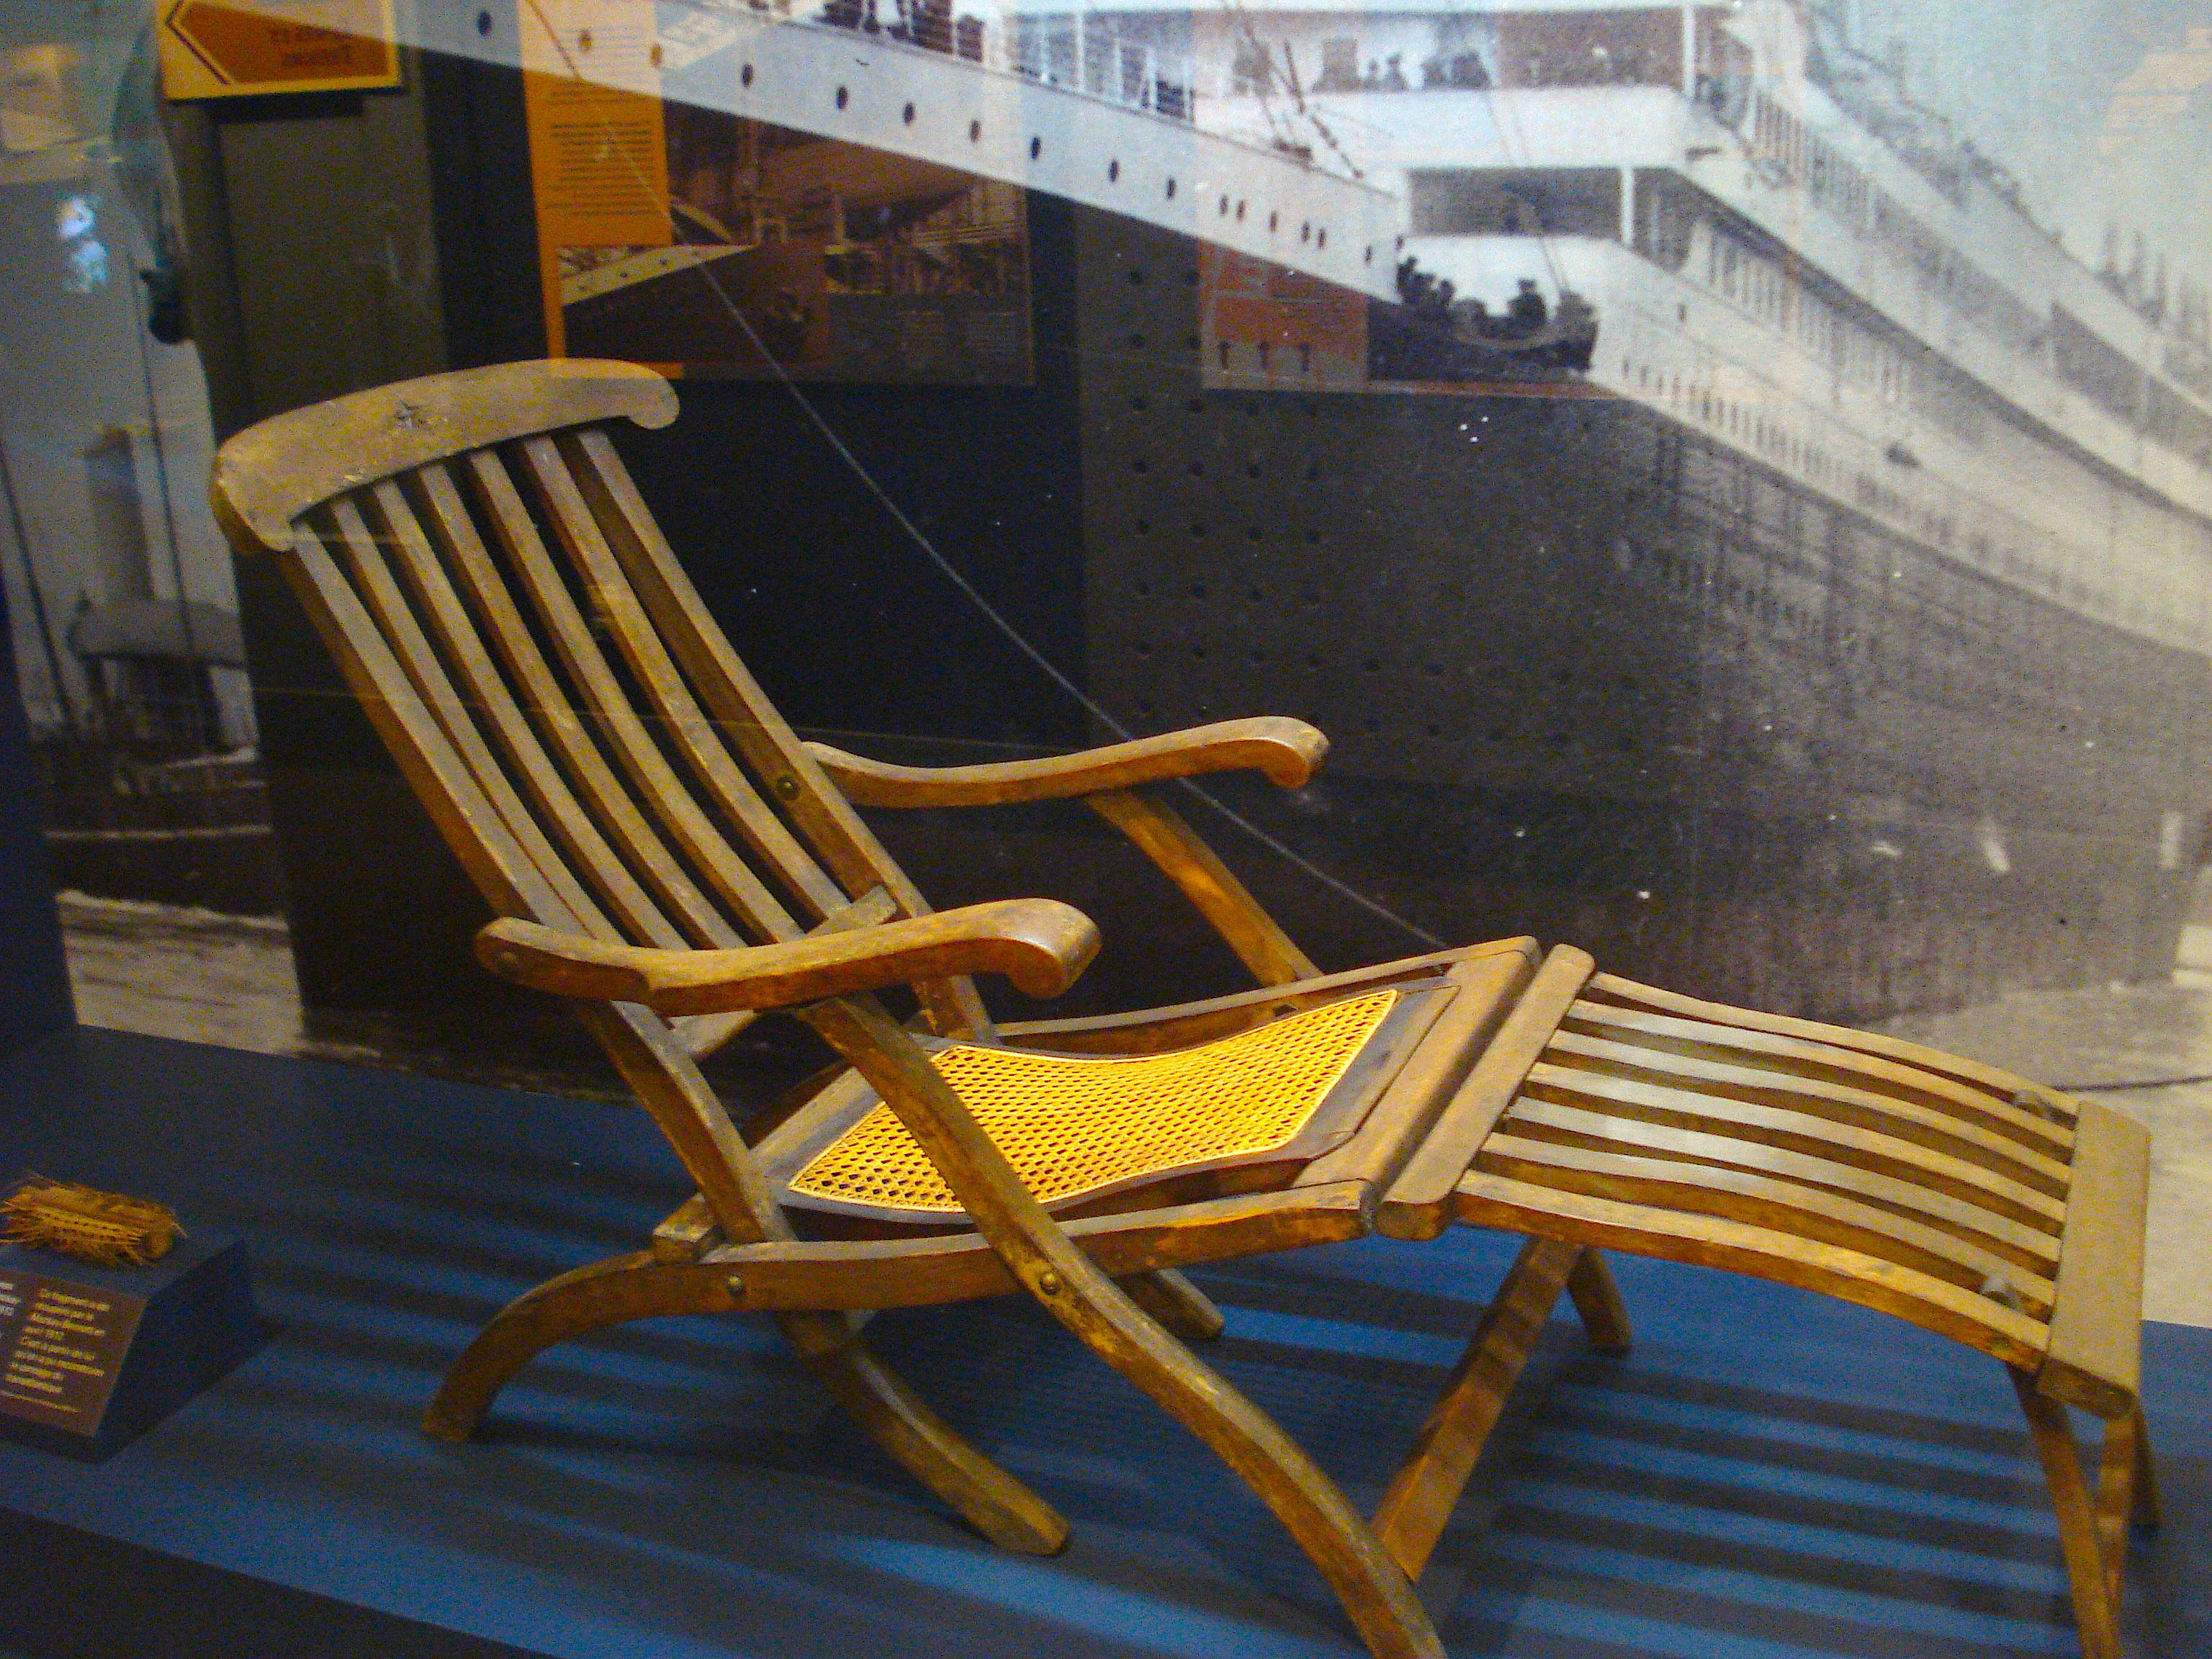 Pin Titanic Deck Chair on Pinterest